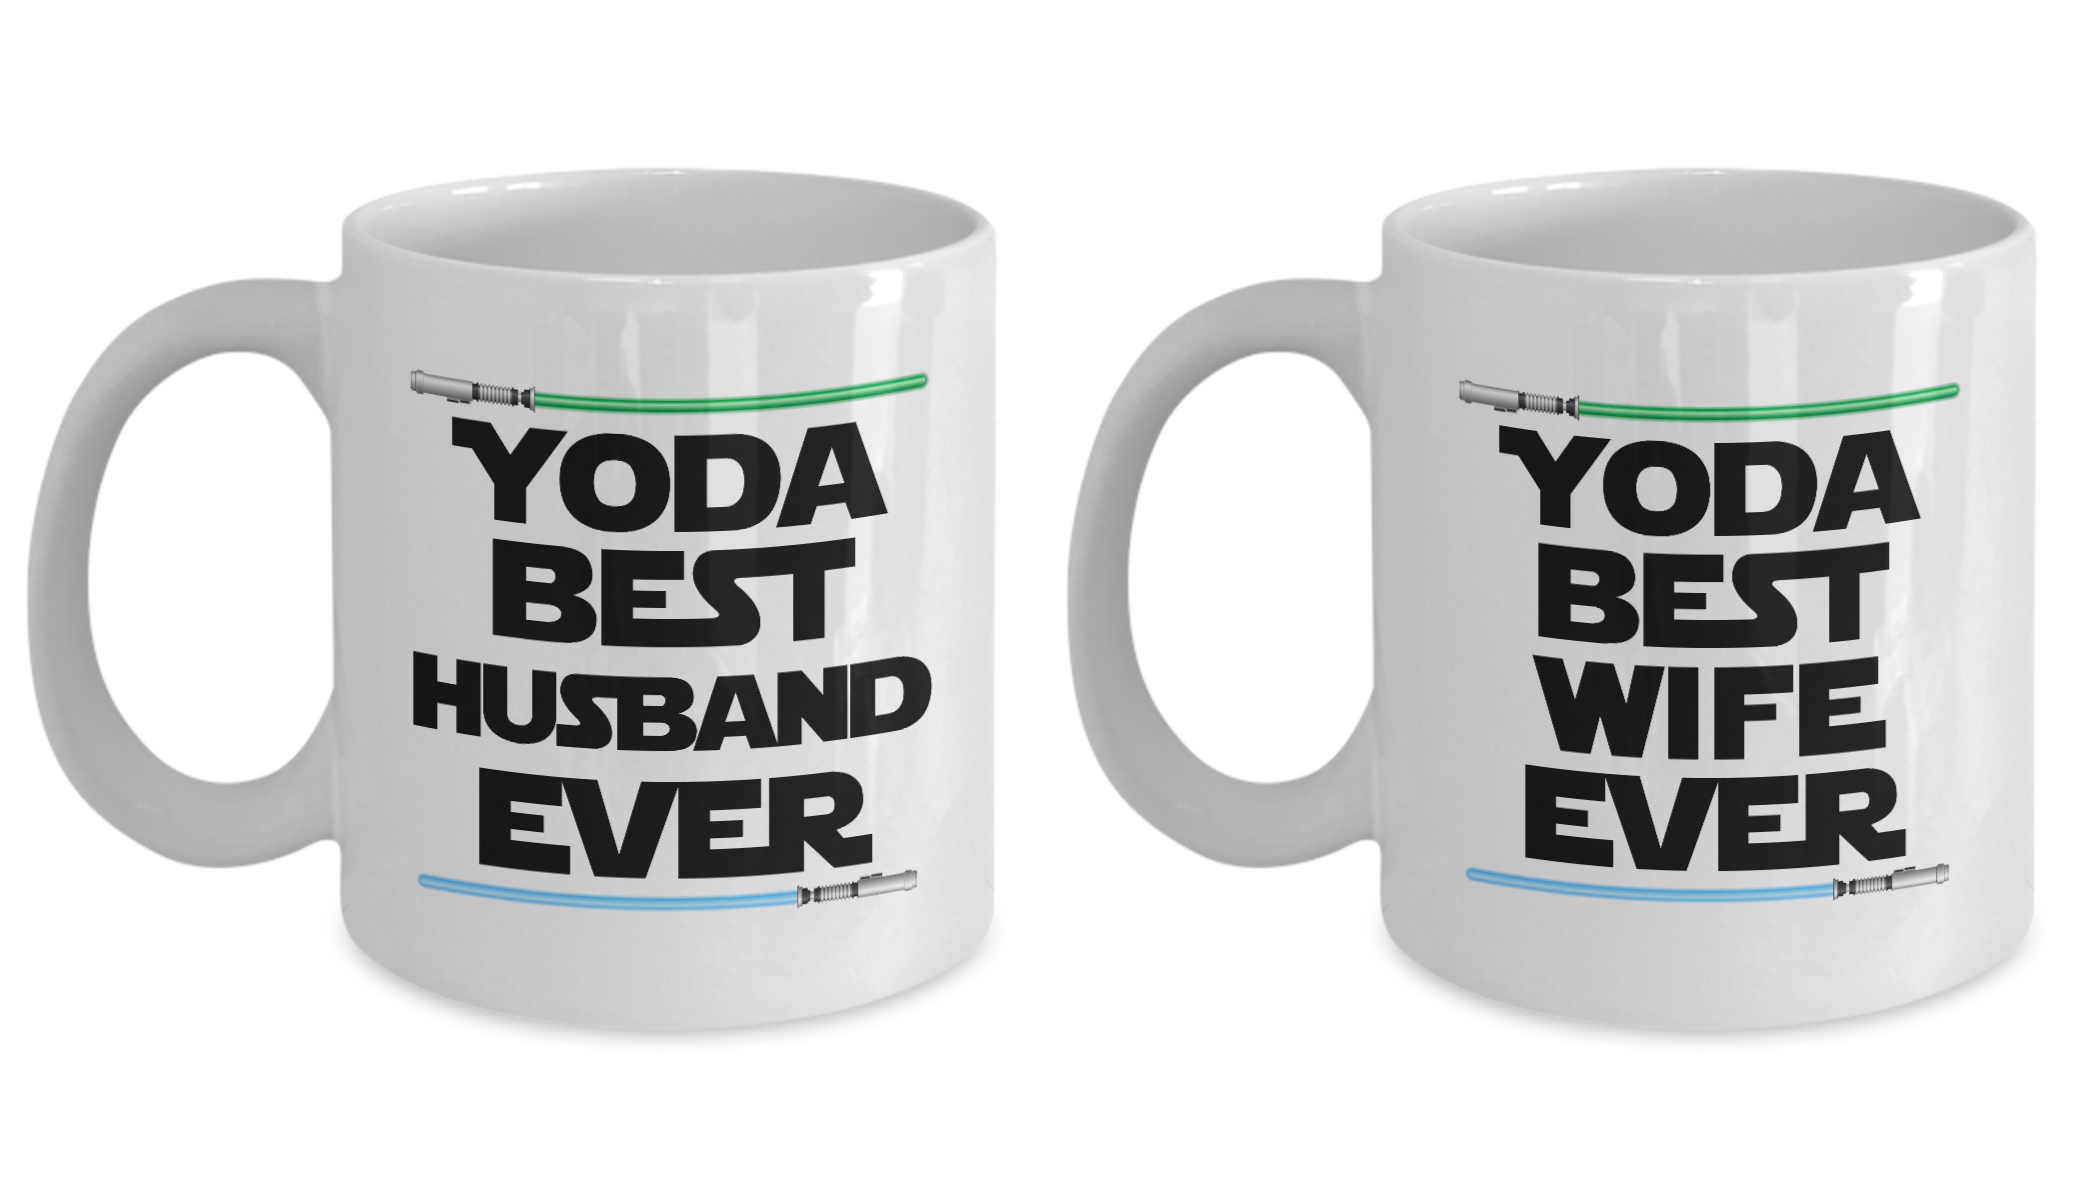 Yoda Best Husband And Wife Gift Mug SET OF TWO Nerd Star